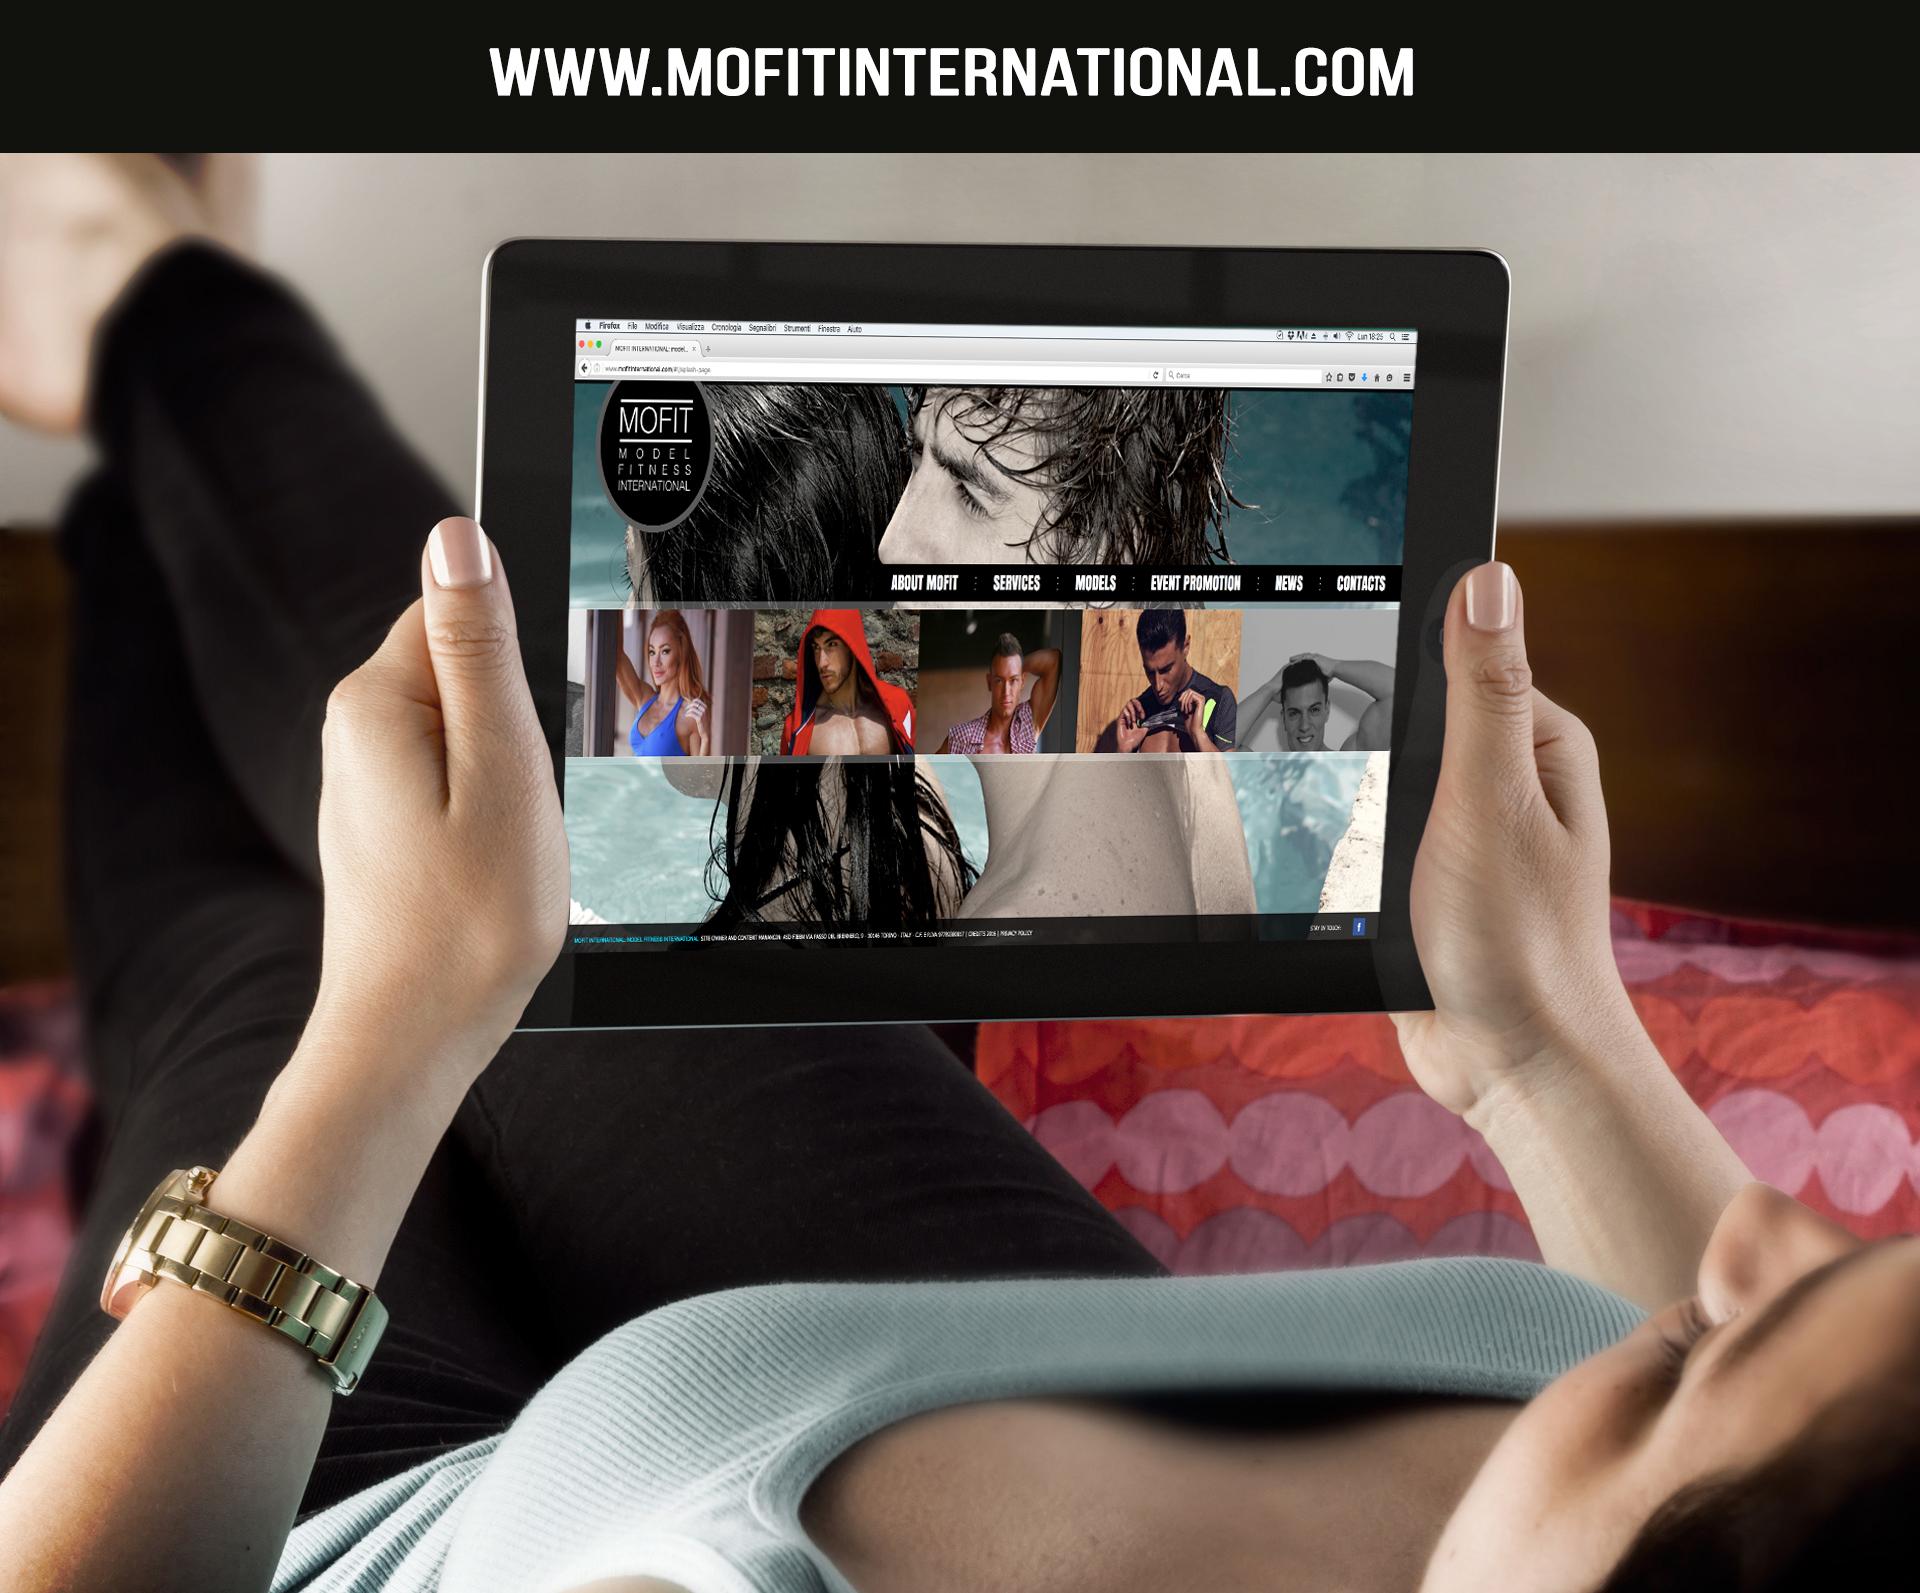 mofit_model fitness international